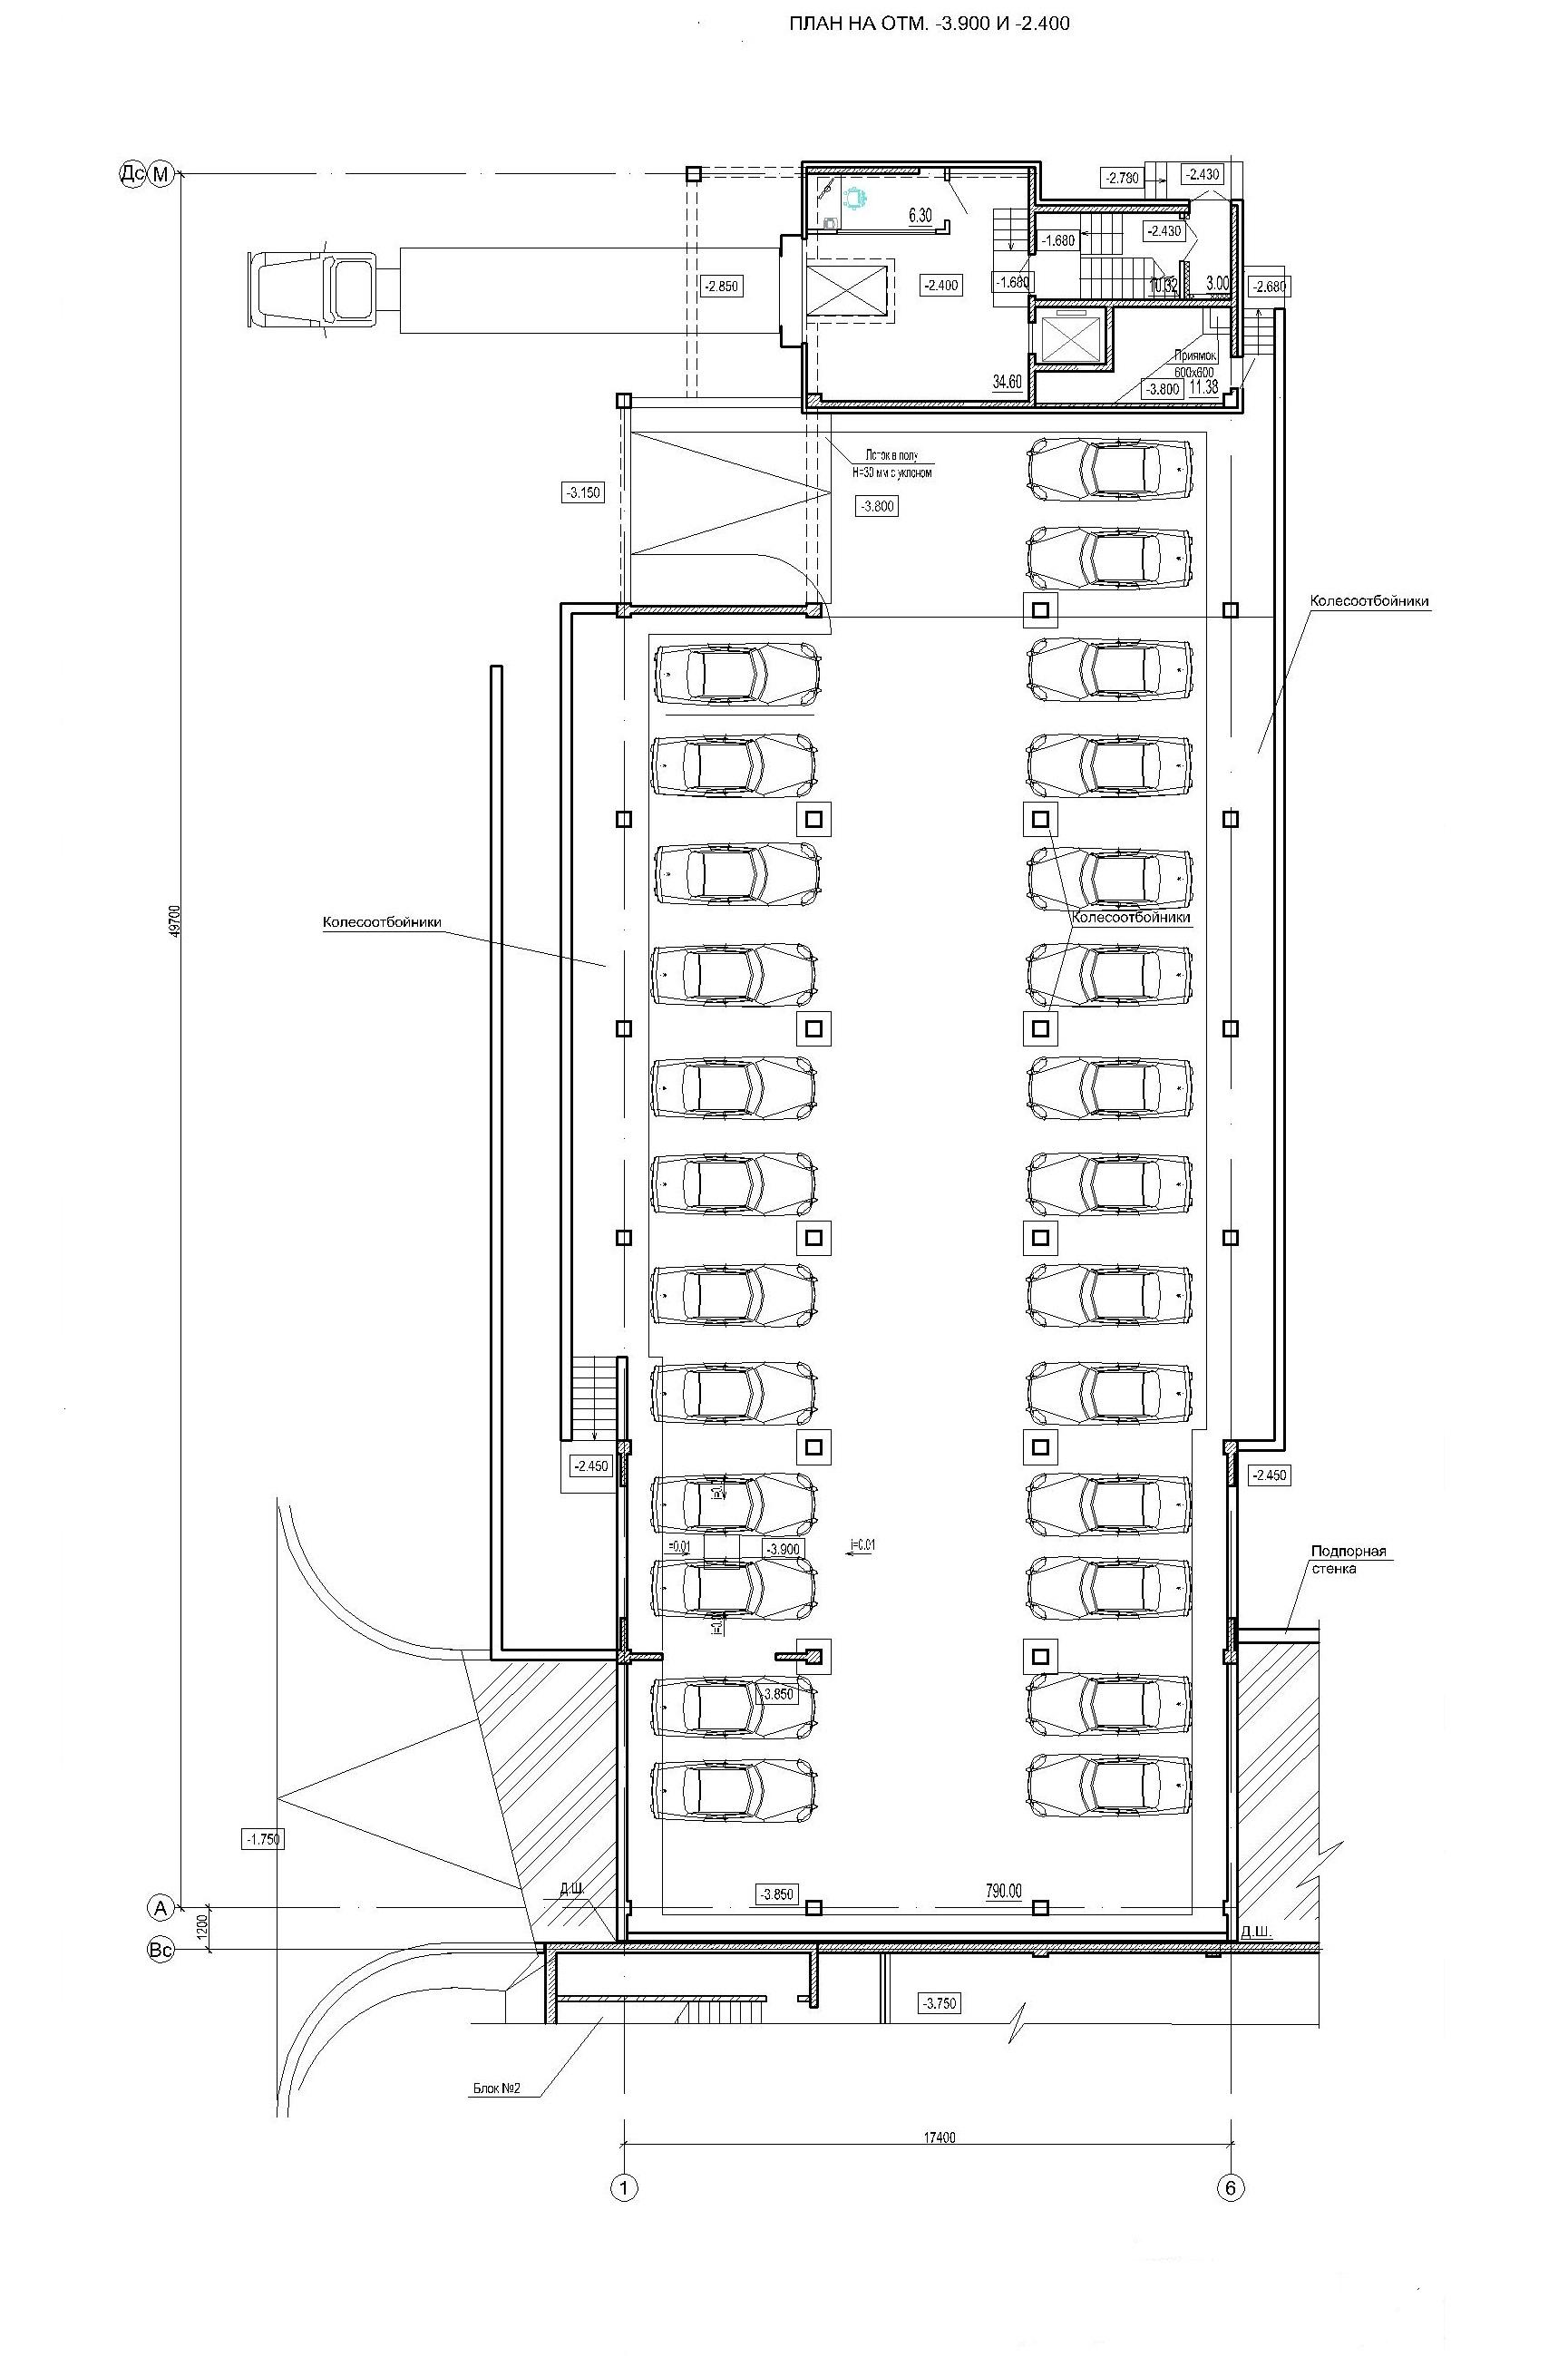 Проект логистического комплекса. План на отм.-3.900 (блок 1)